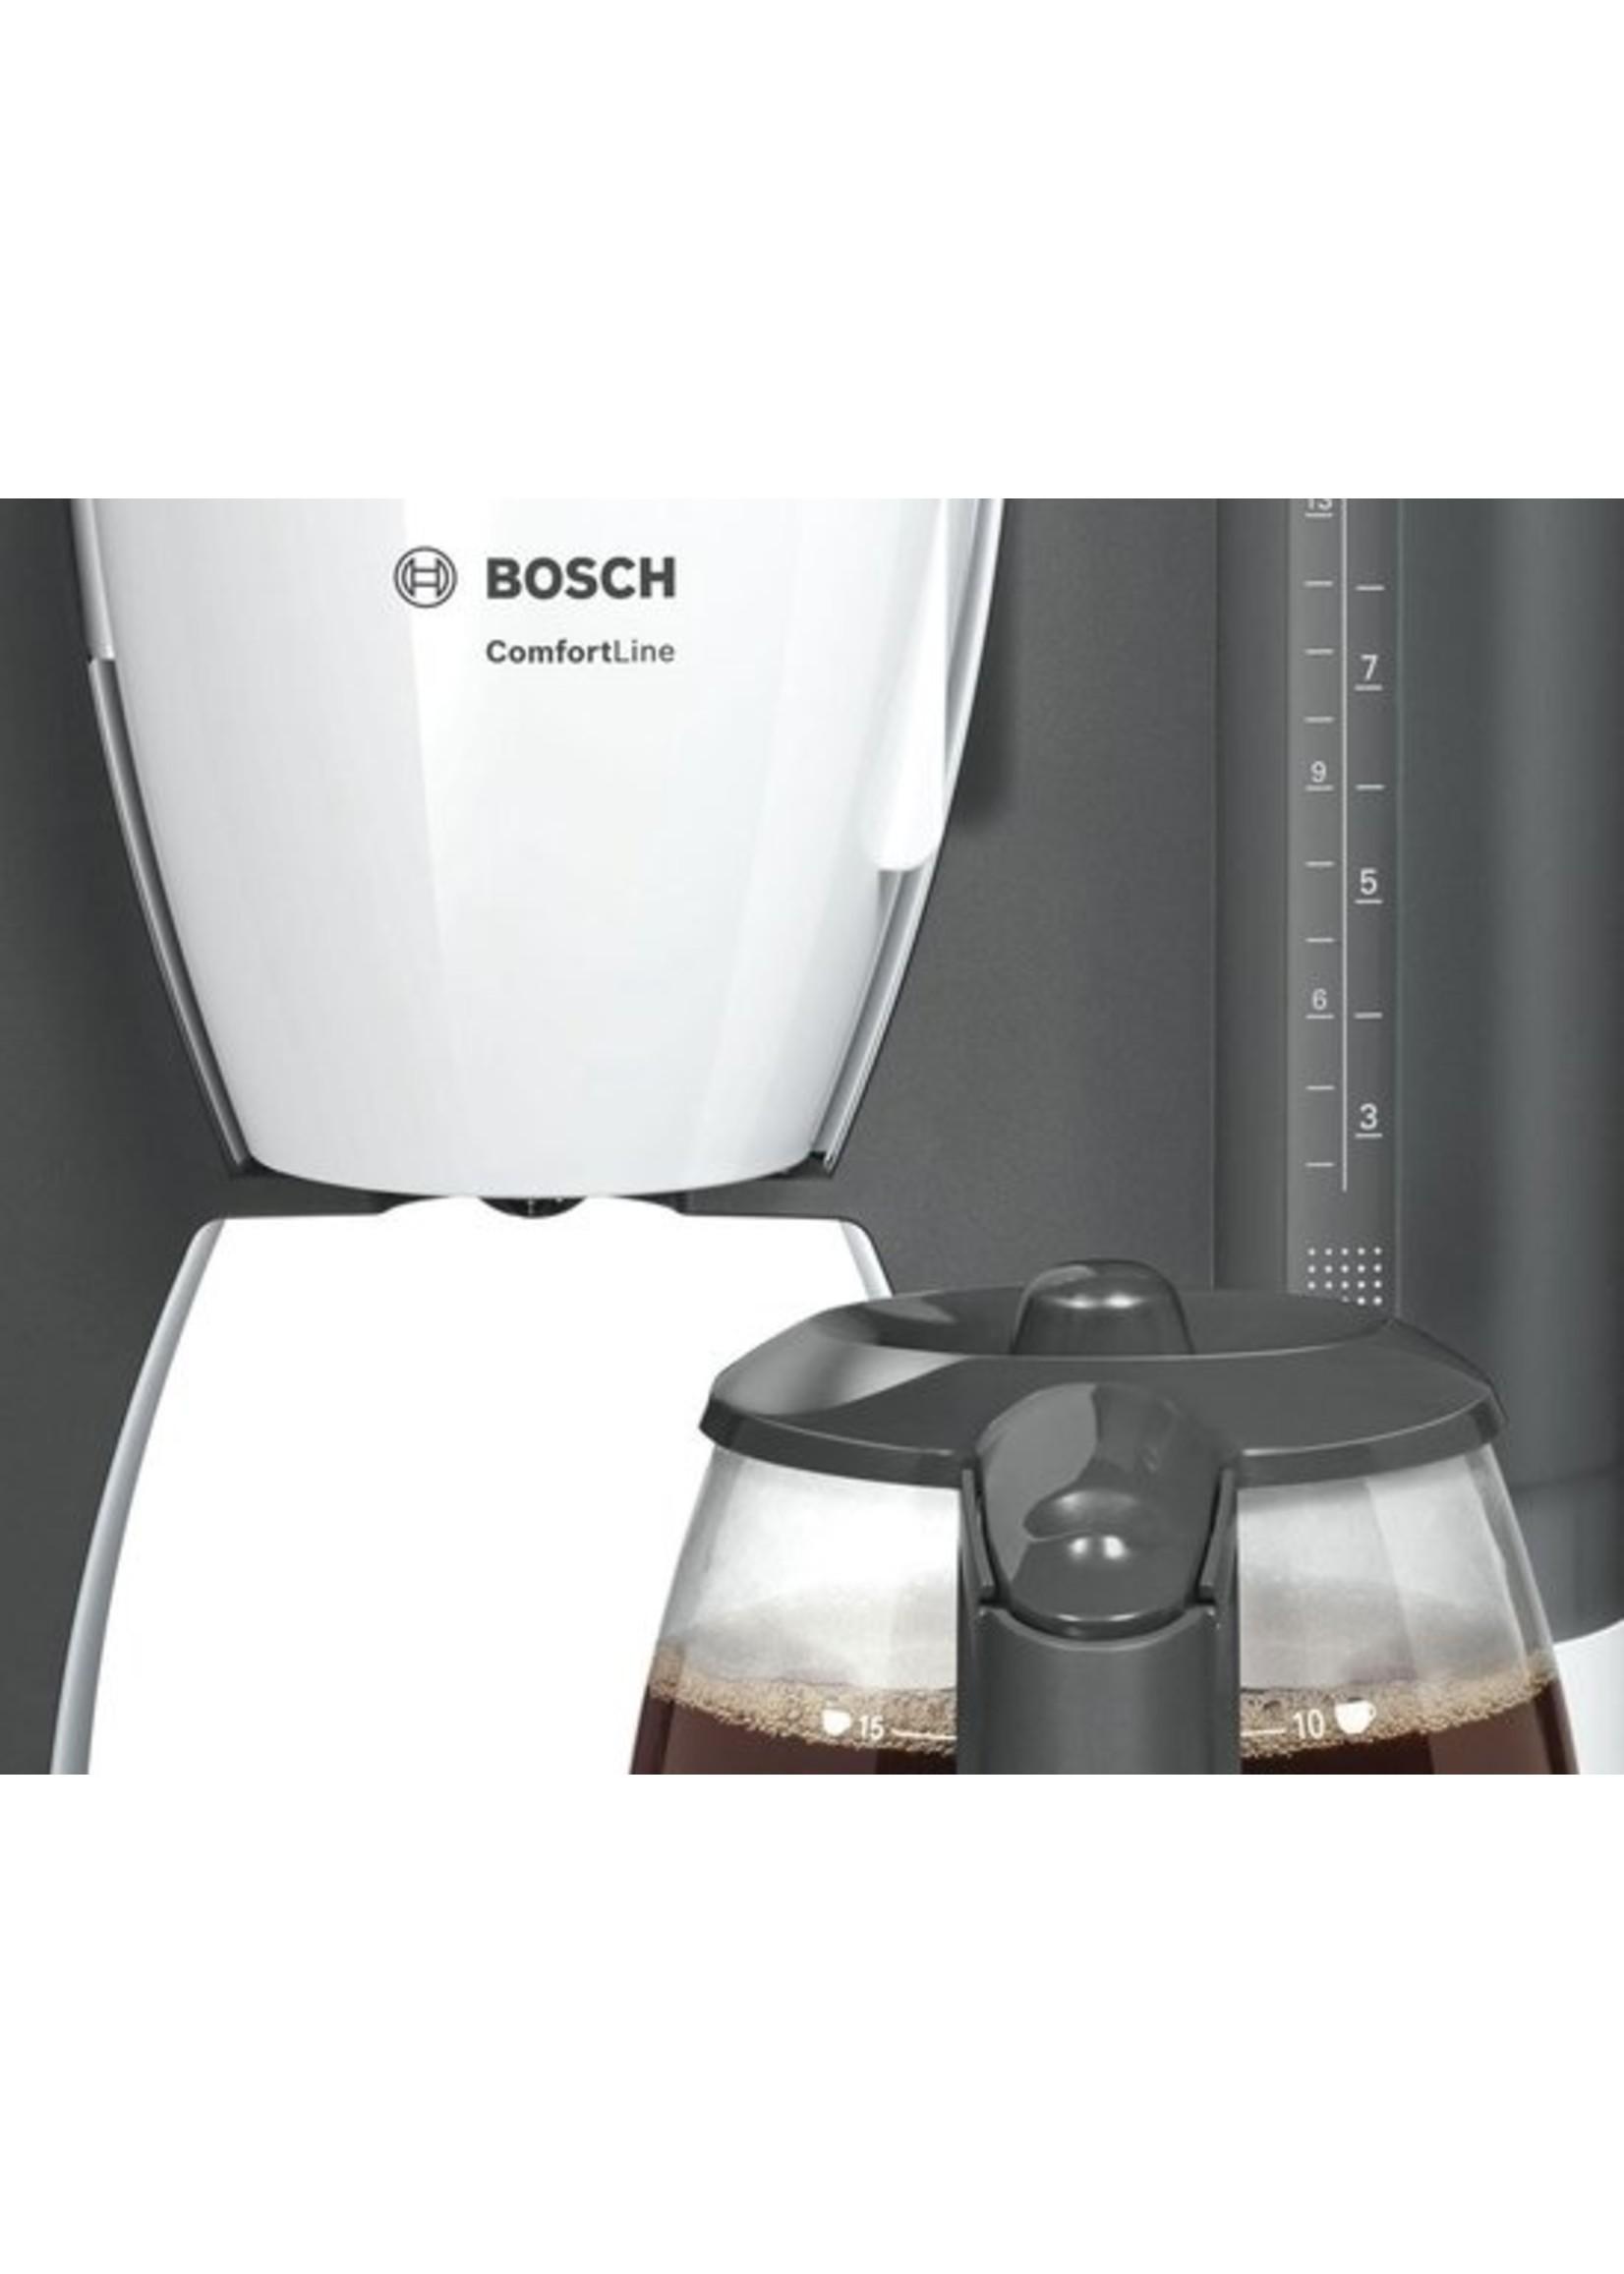 Bosch Bosch TKA6A041 ComfortLine  - Koffiezetapparaat - Wit